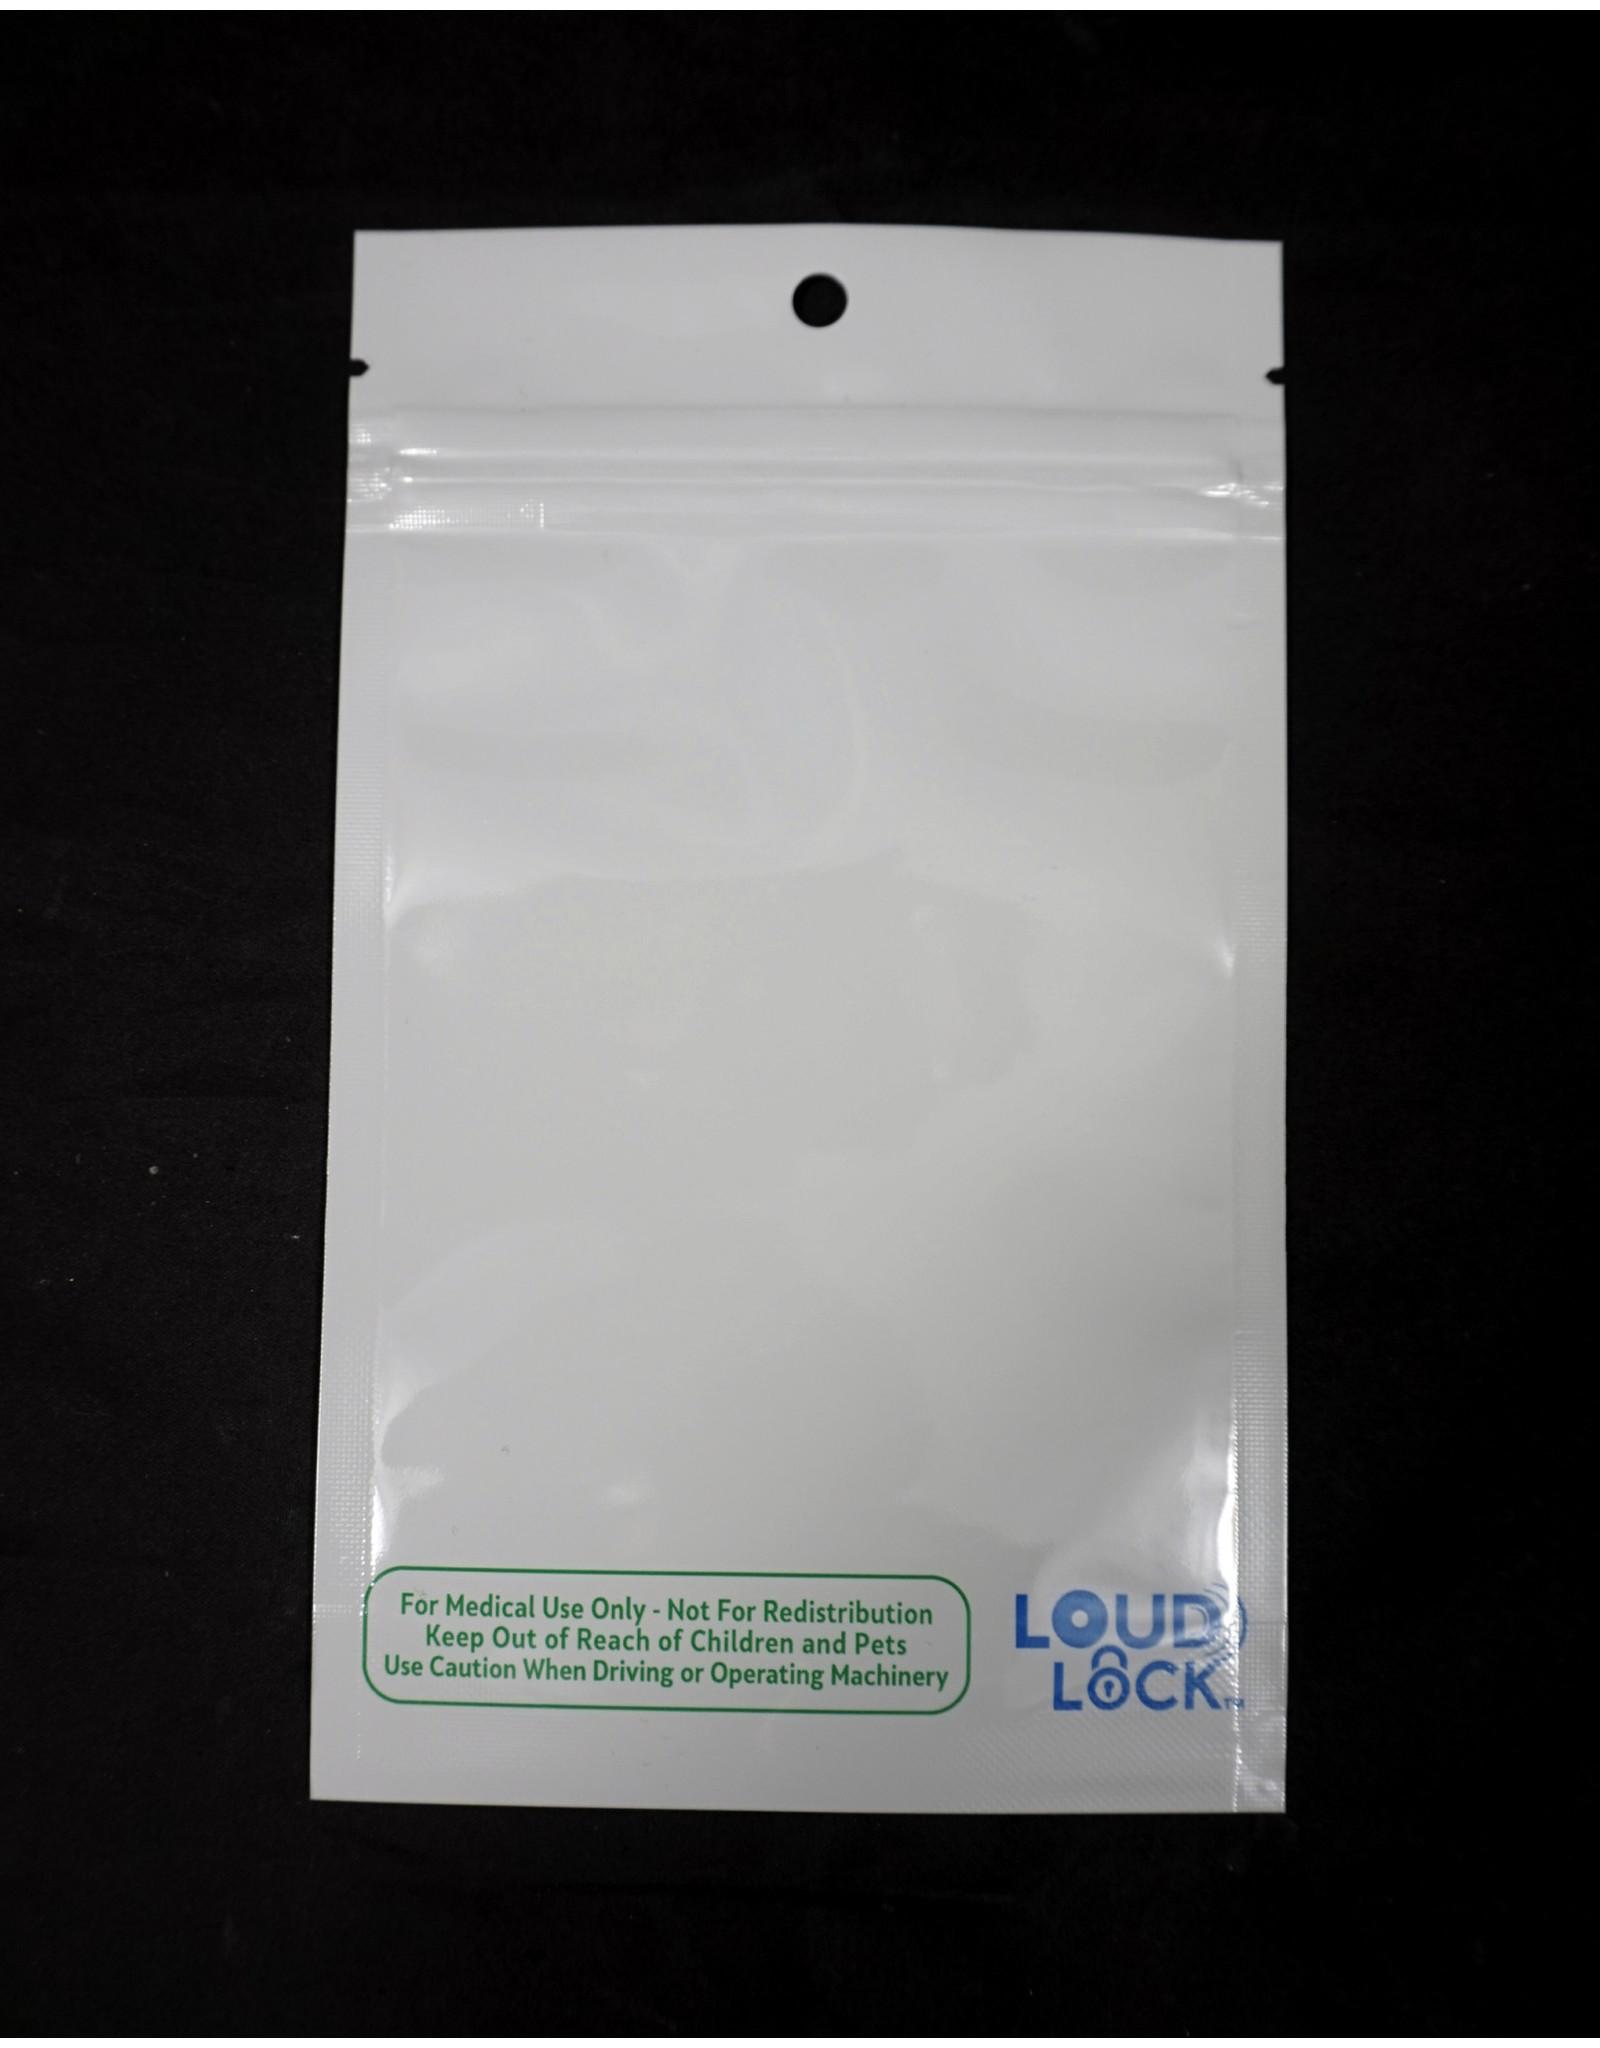 Loud Lock Loud Lock All States White Mylar Bags 1/4oz